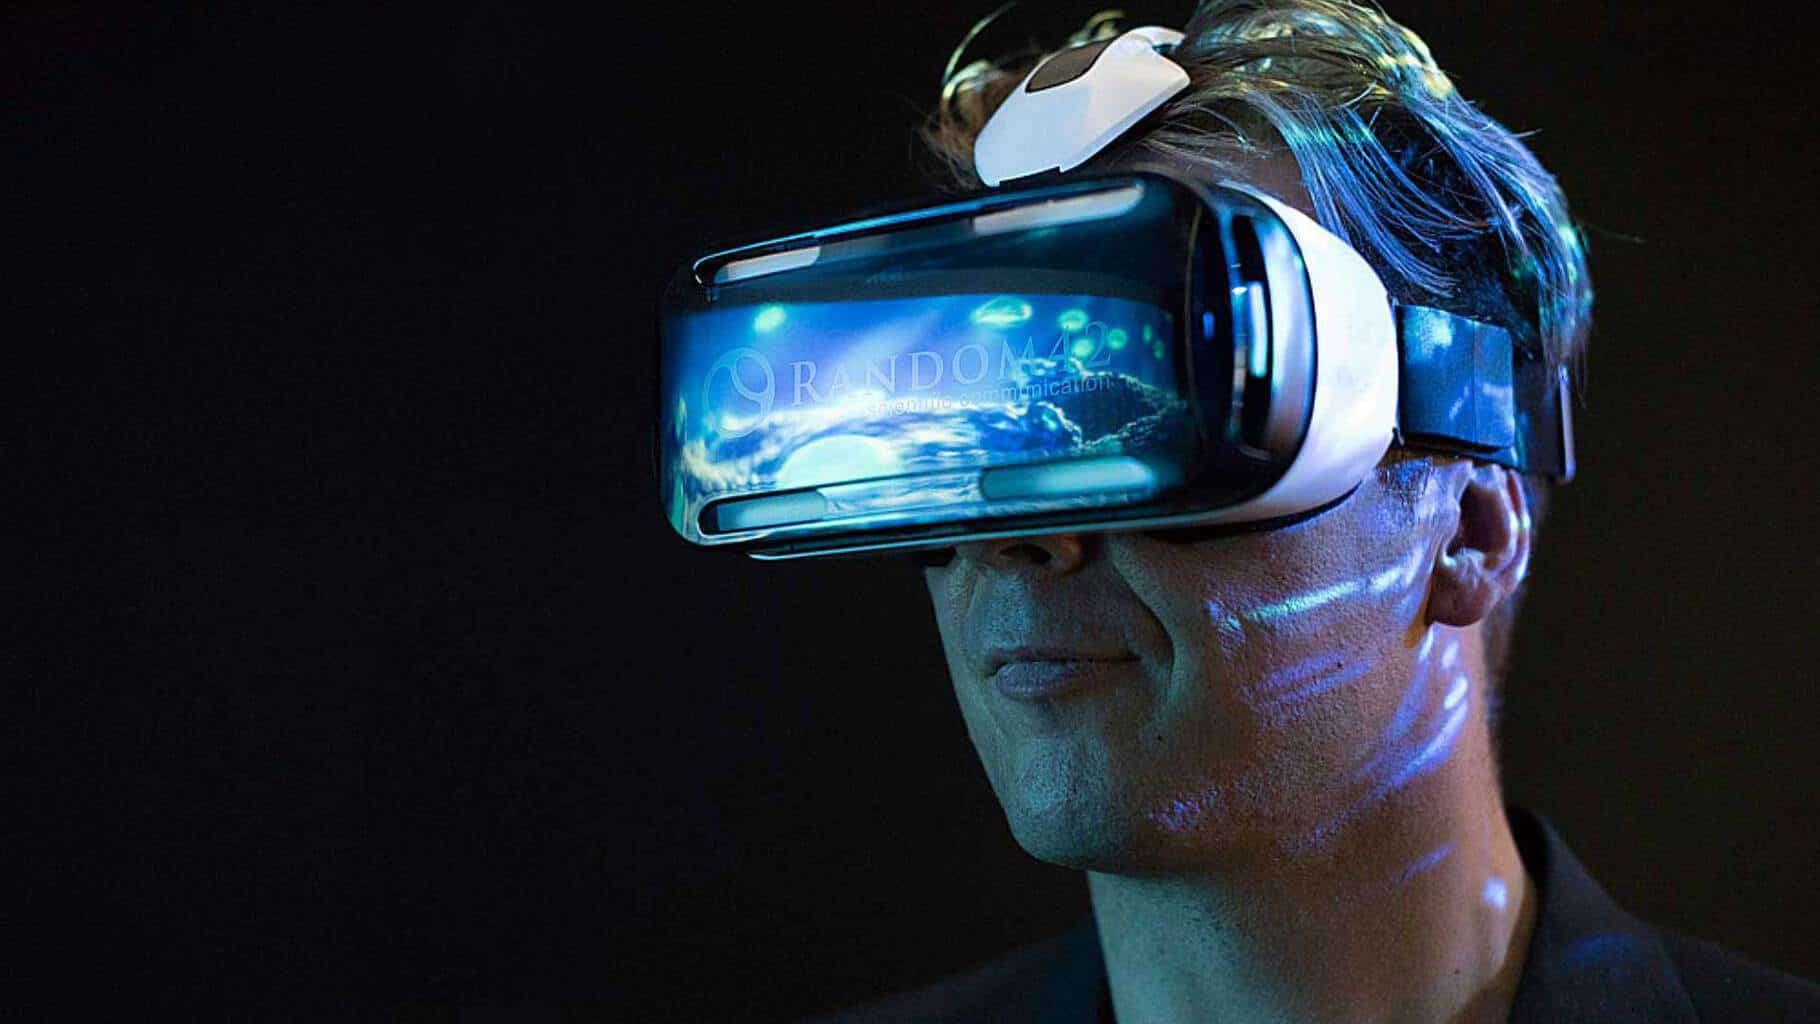 Random42-Oculus-GearVR-Headset